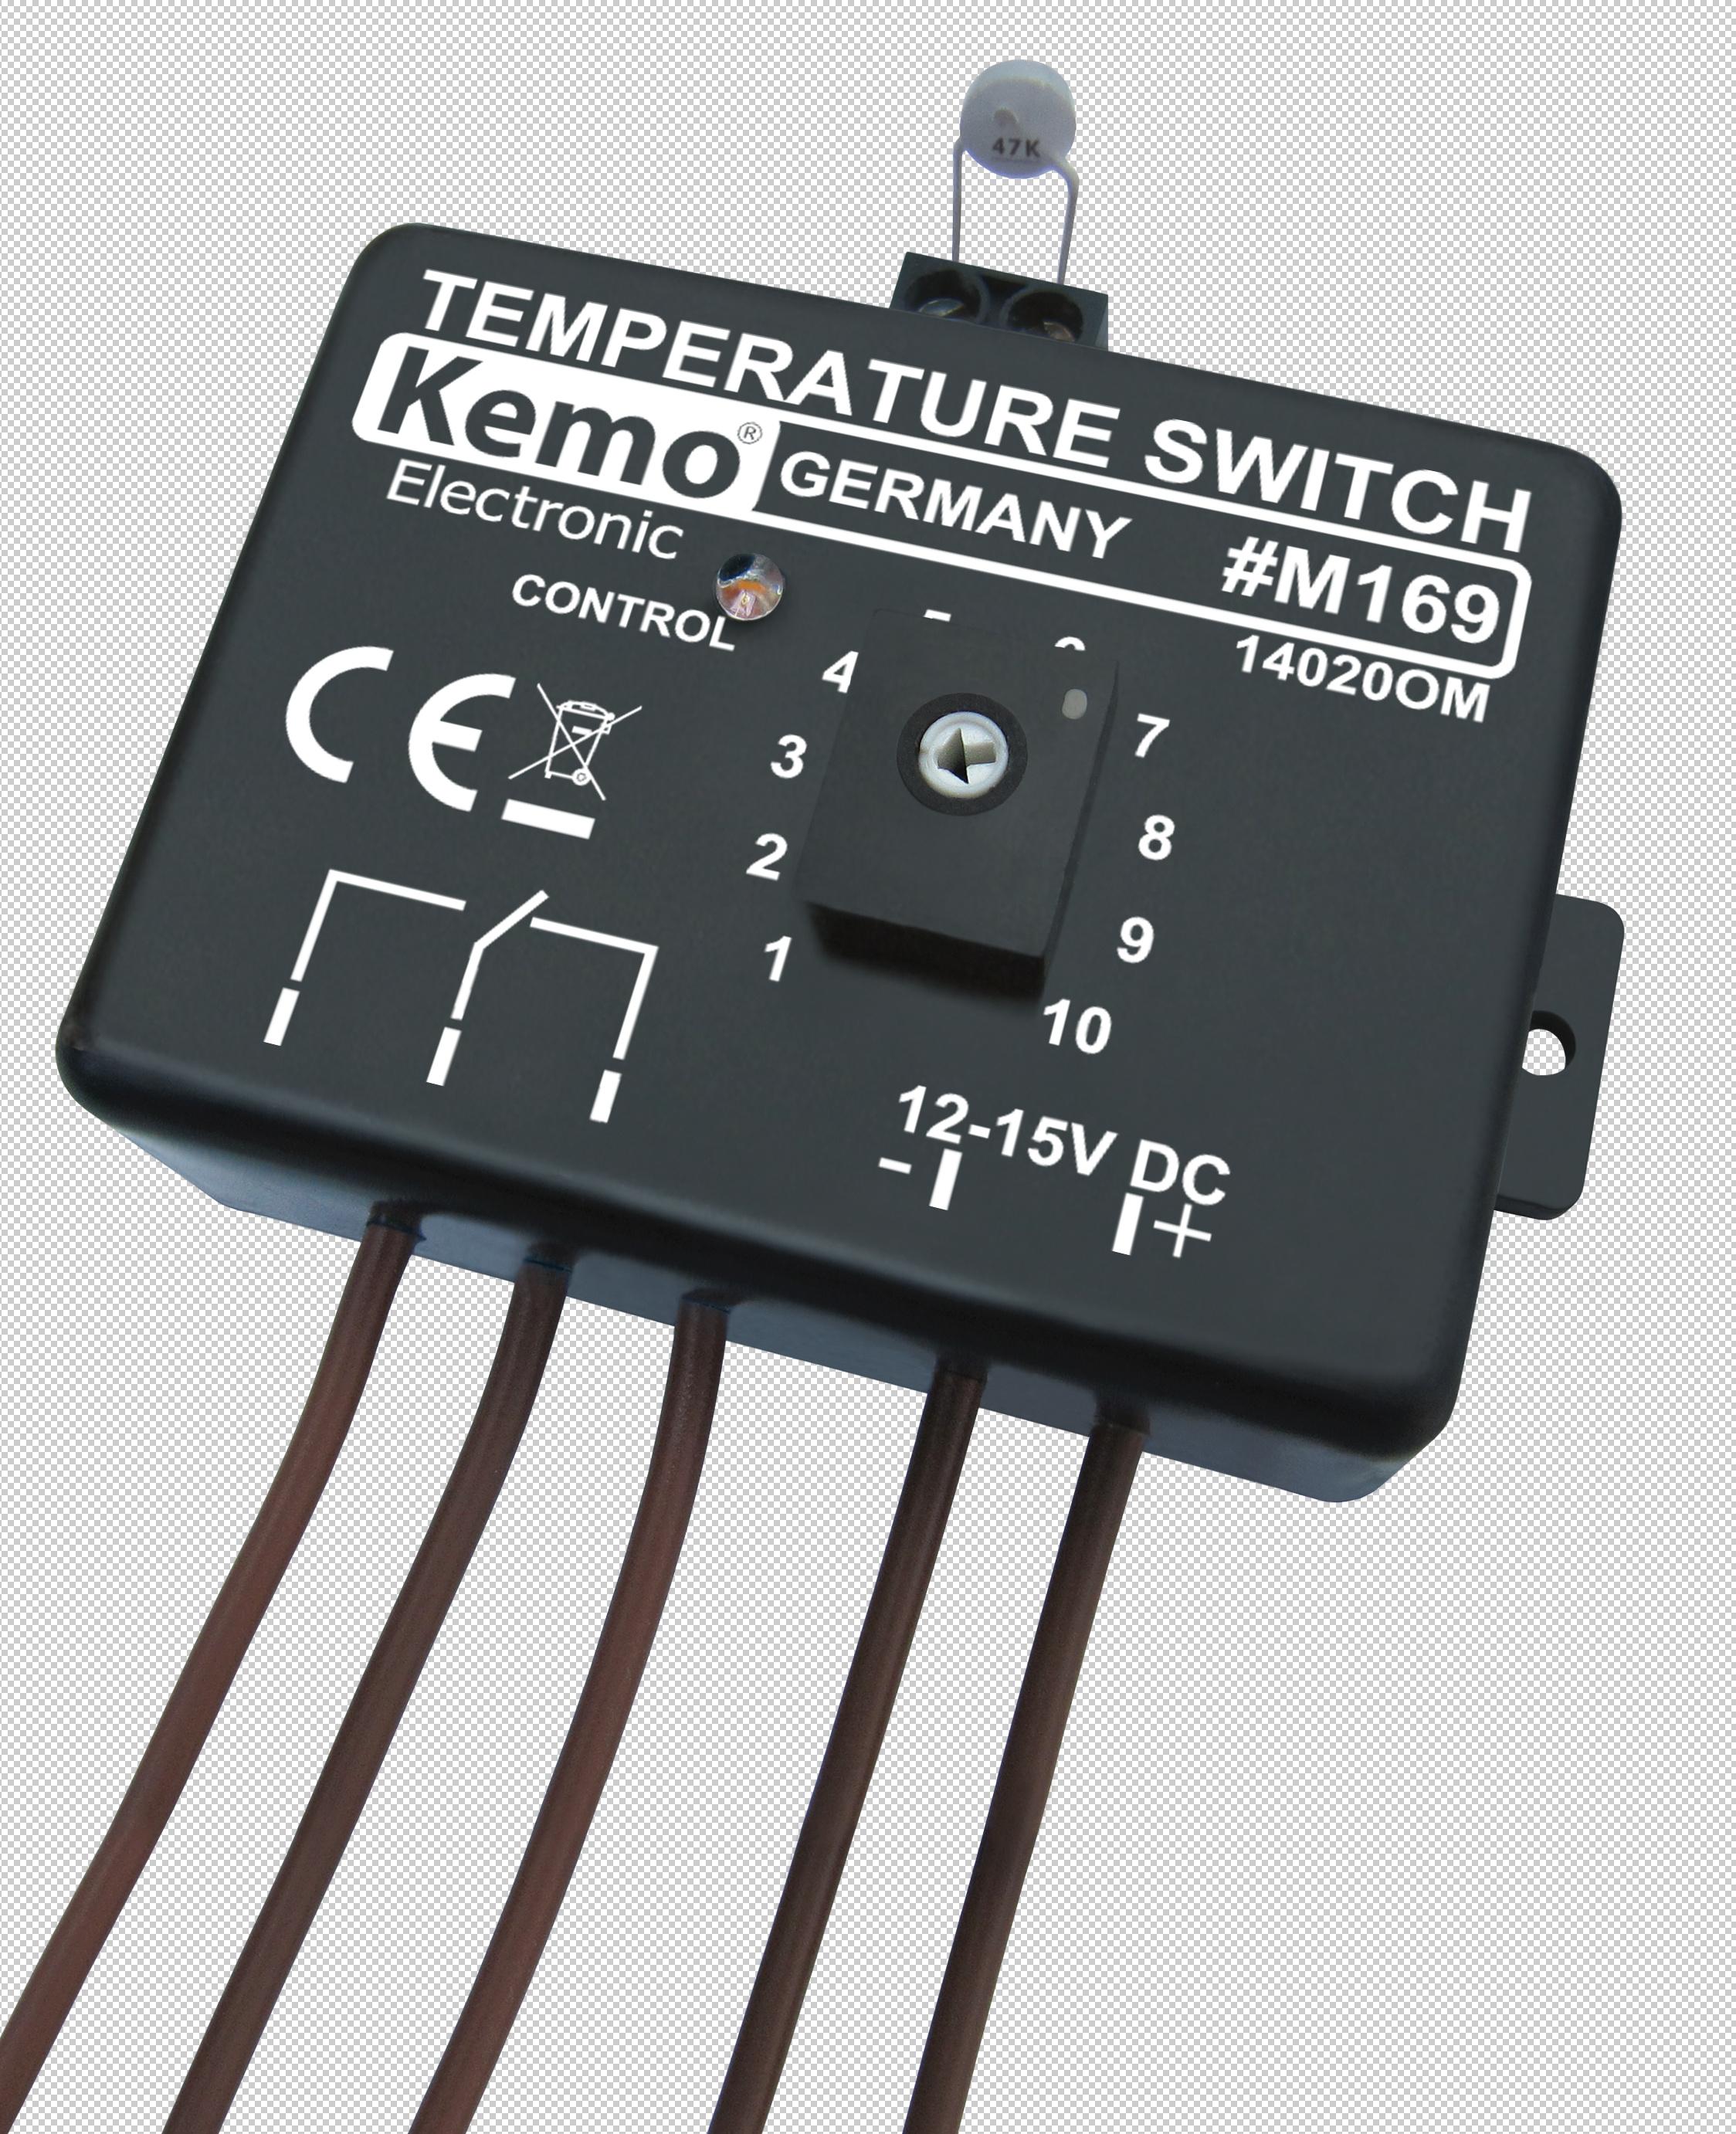 Kemo-Temperaturschalter-Temperatur-Regler-Thermostat